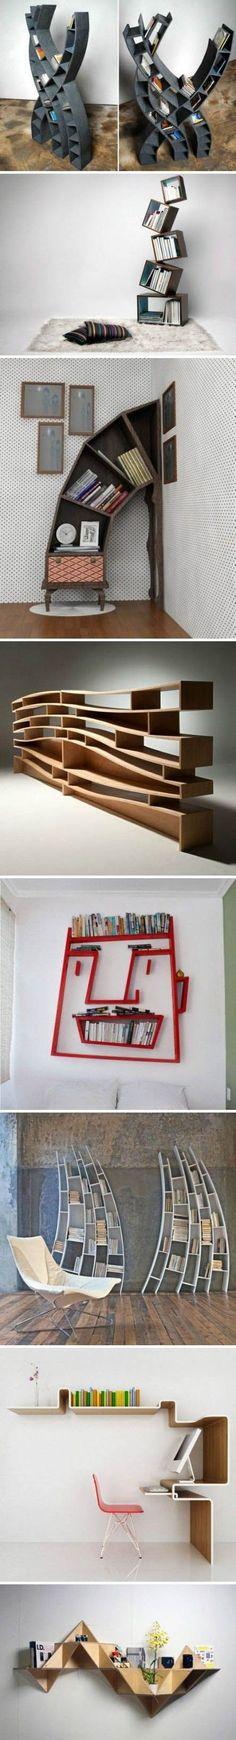 Cool Bookshelf | DIY Crafts Tutorials by olga